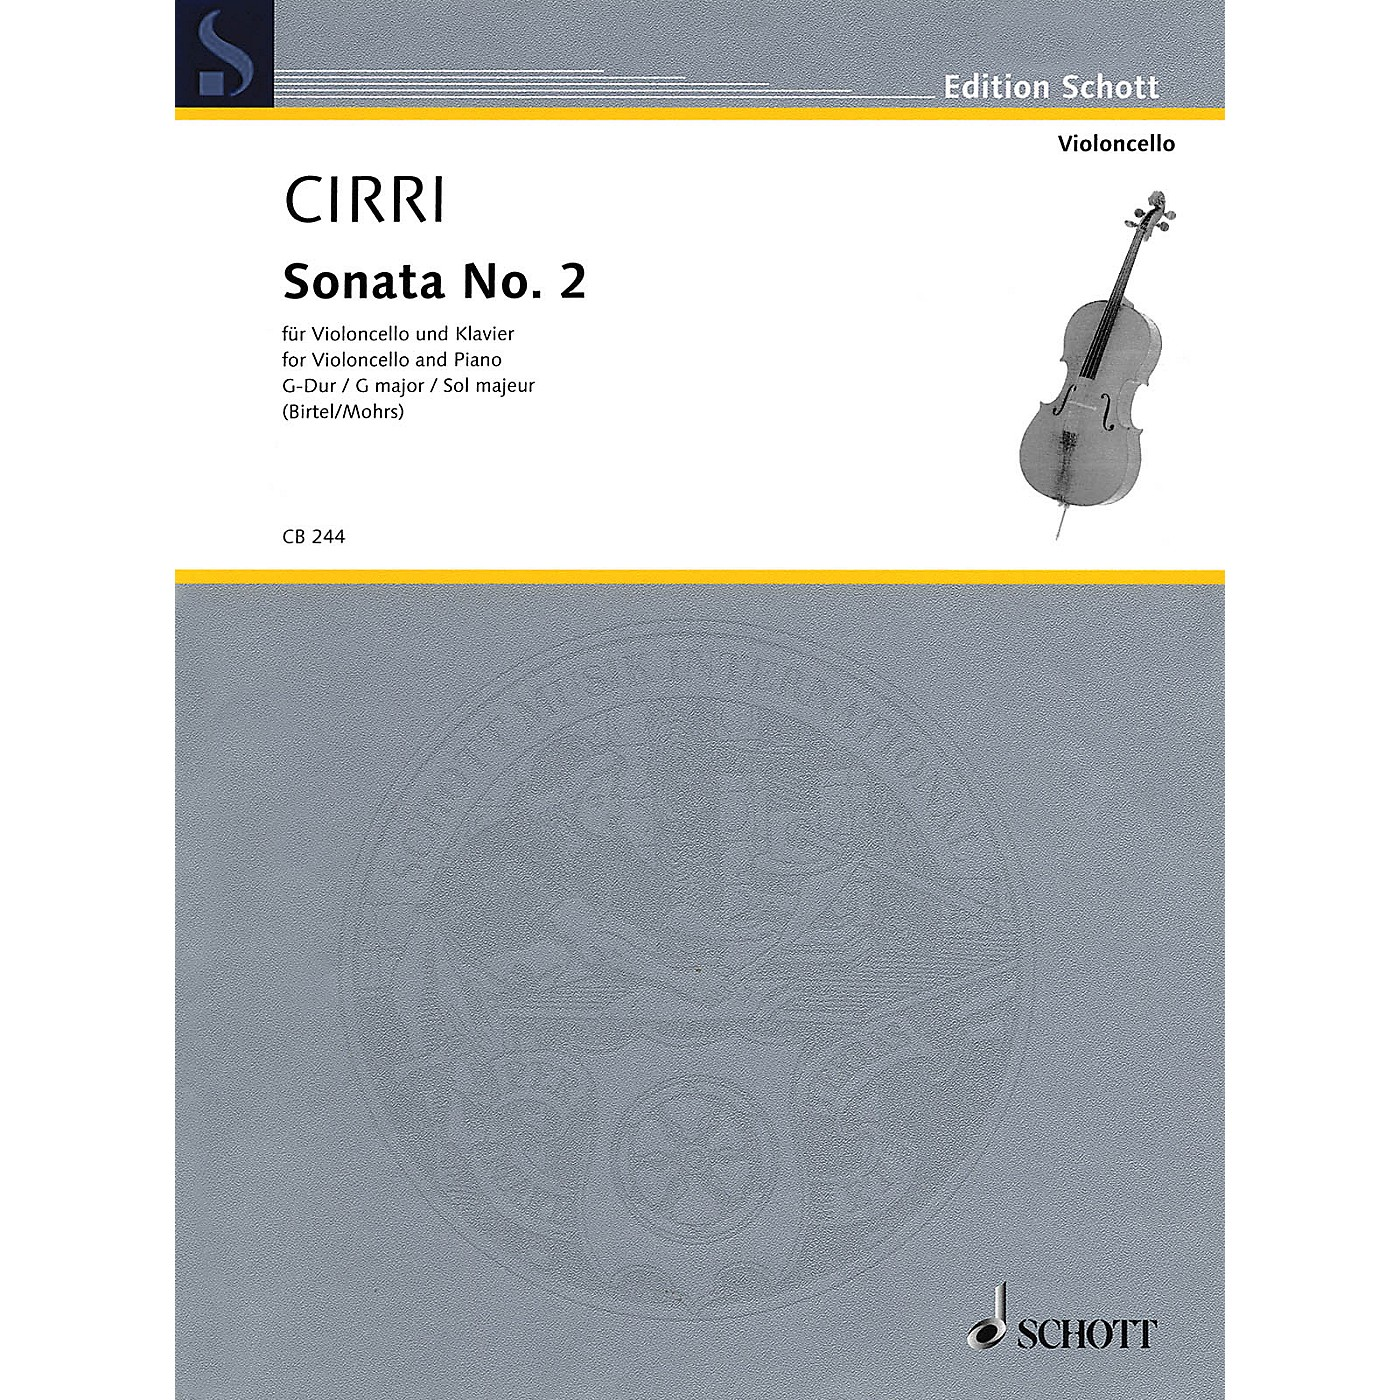 Schott Sonata No. 2 in G Major Schott Softcover Composed by Giovanni Battista Cirri Edited by Rainer Mohrs thumbnail